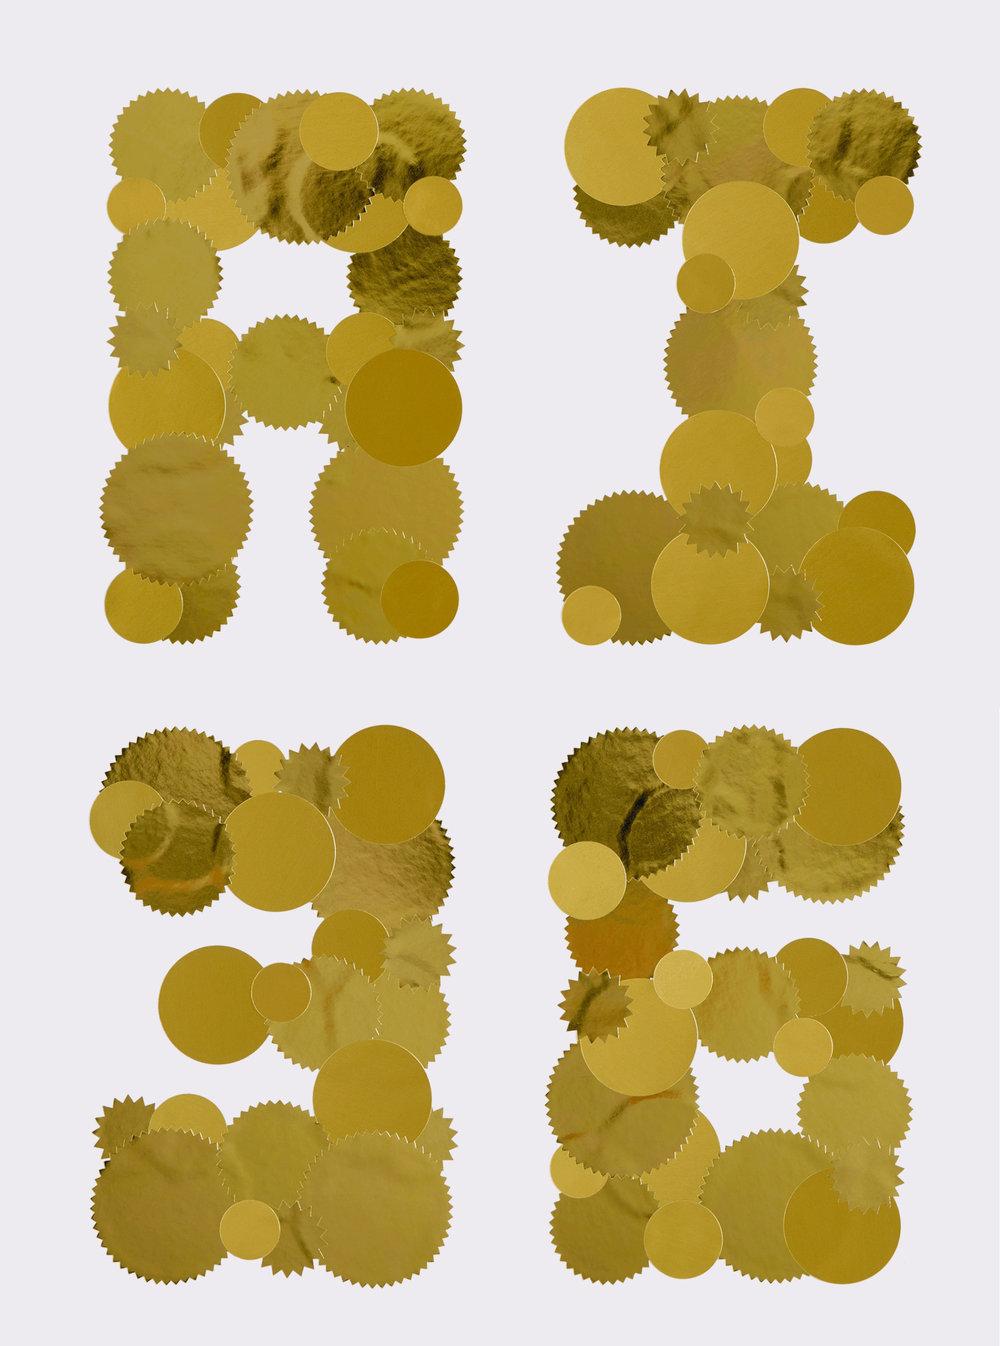 Ai36_Letters2.jpg